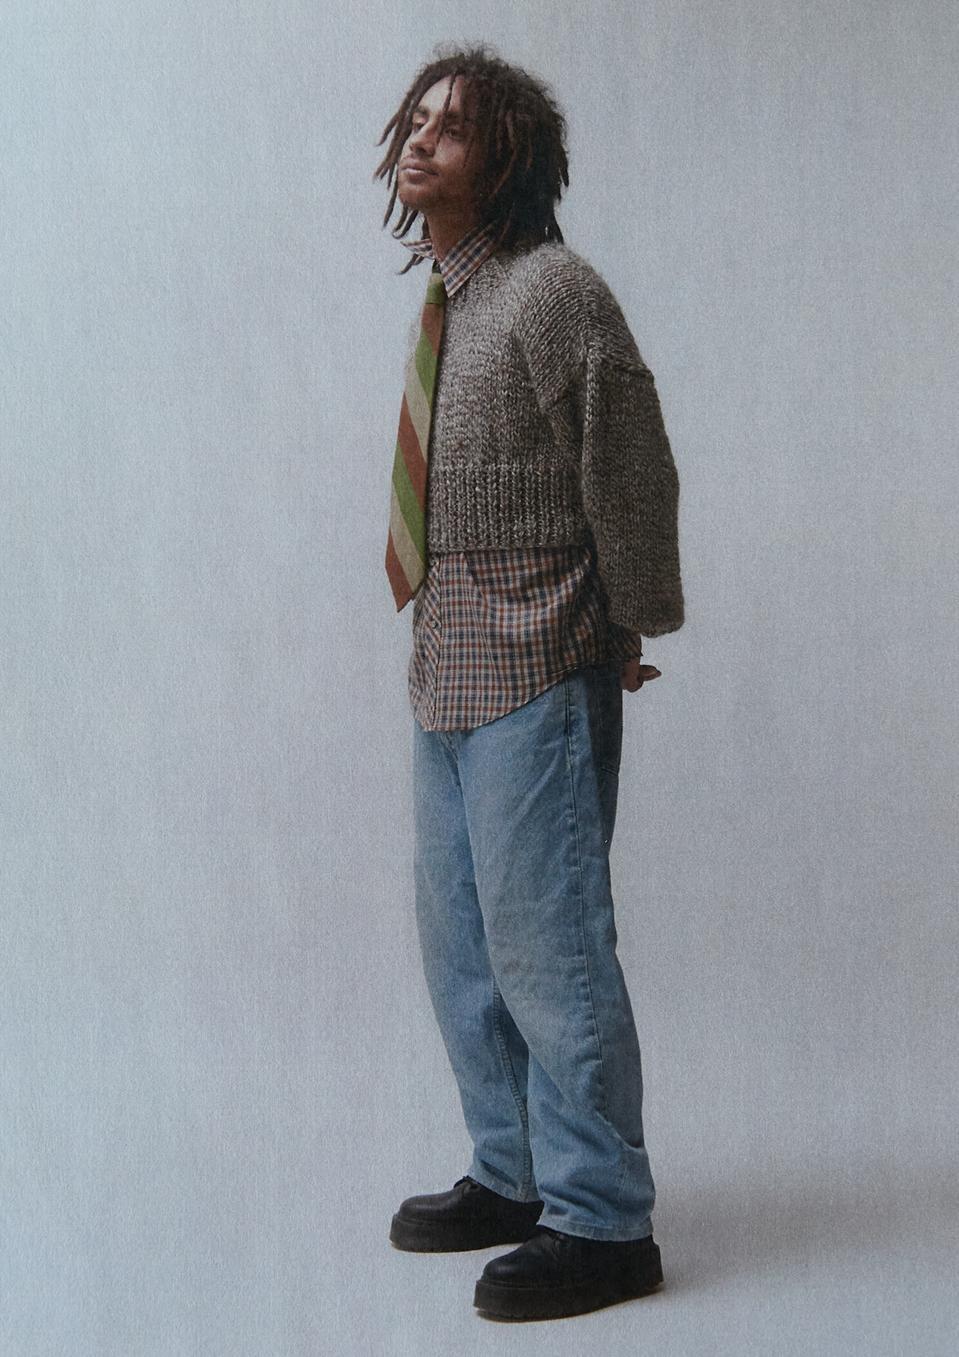 Frisson Knits: Cropped Grandad sweater